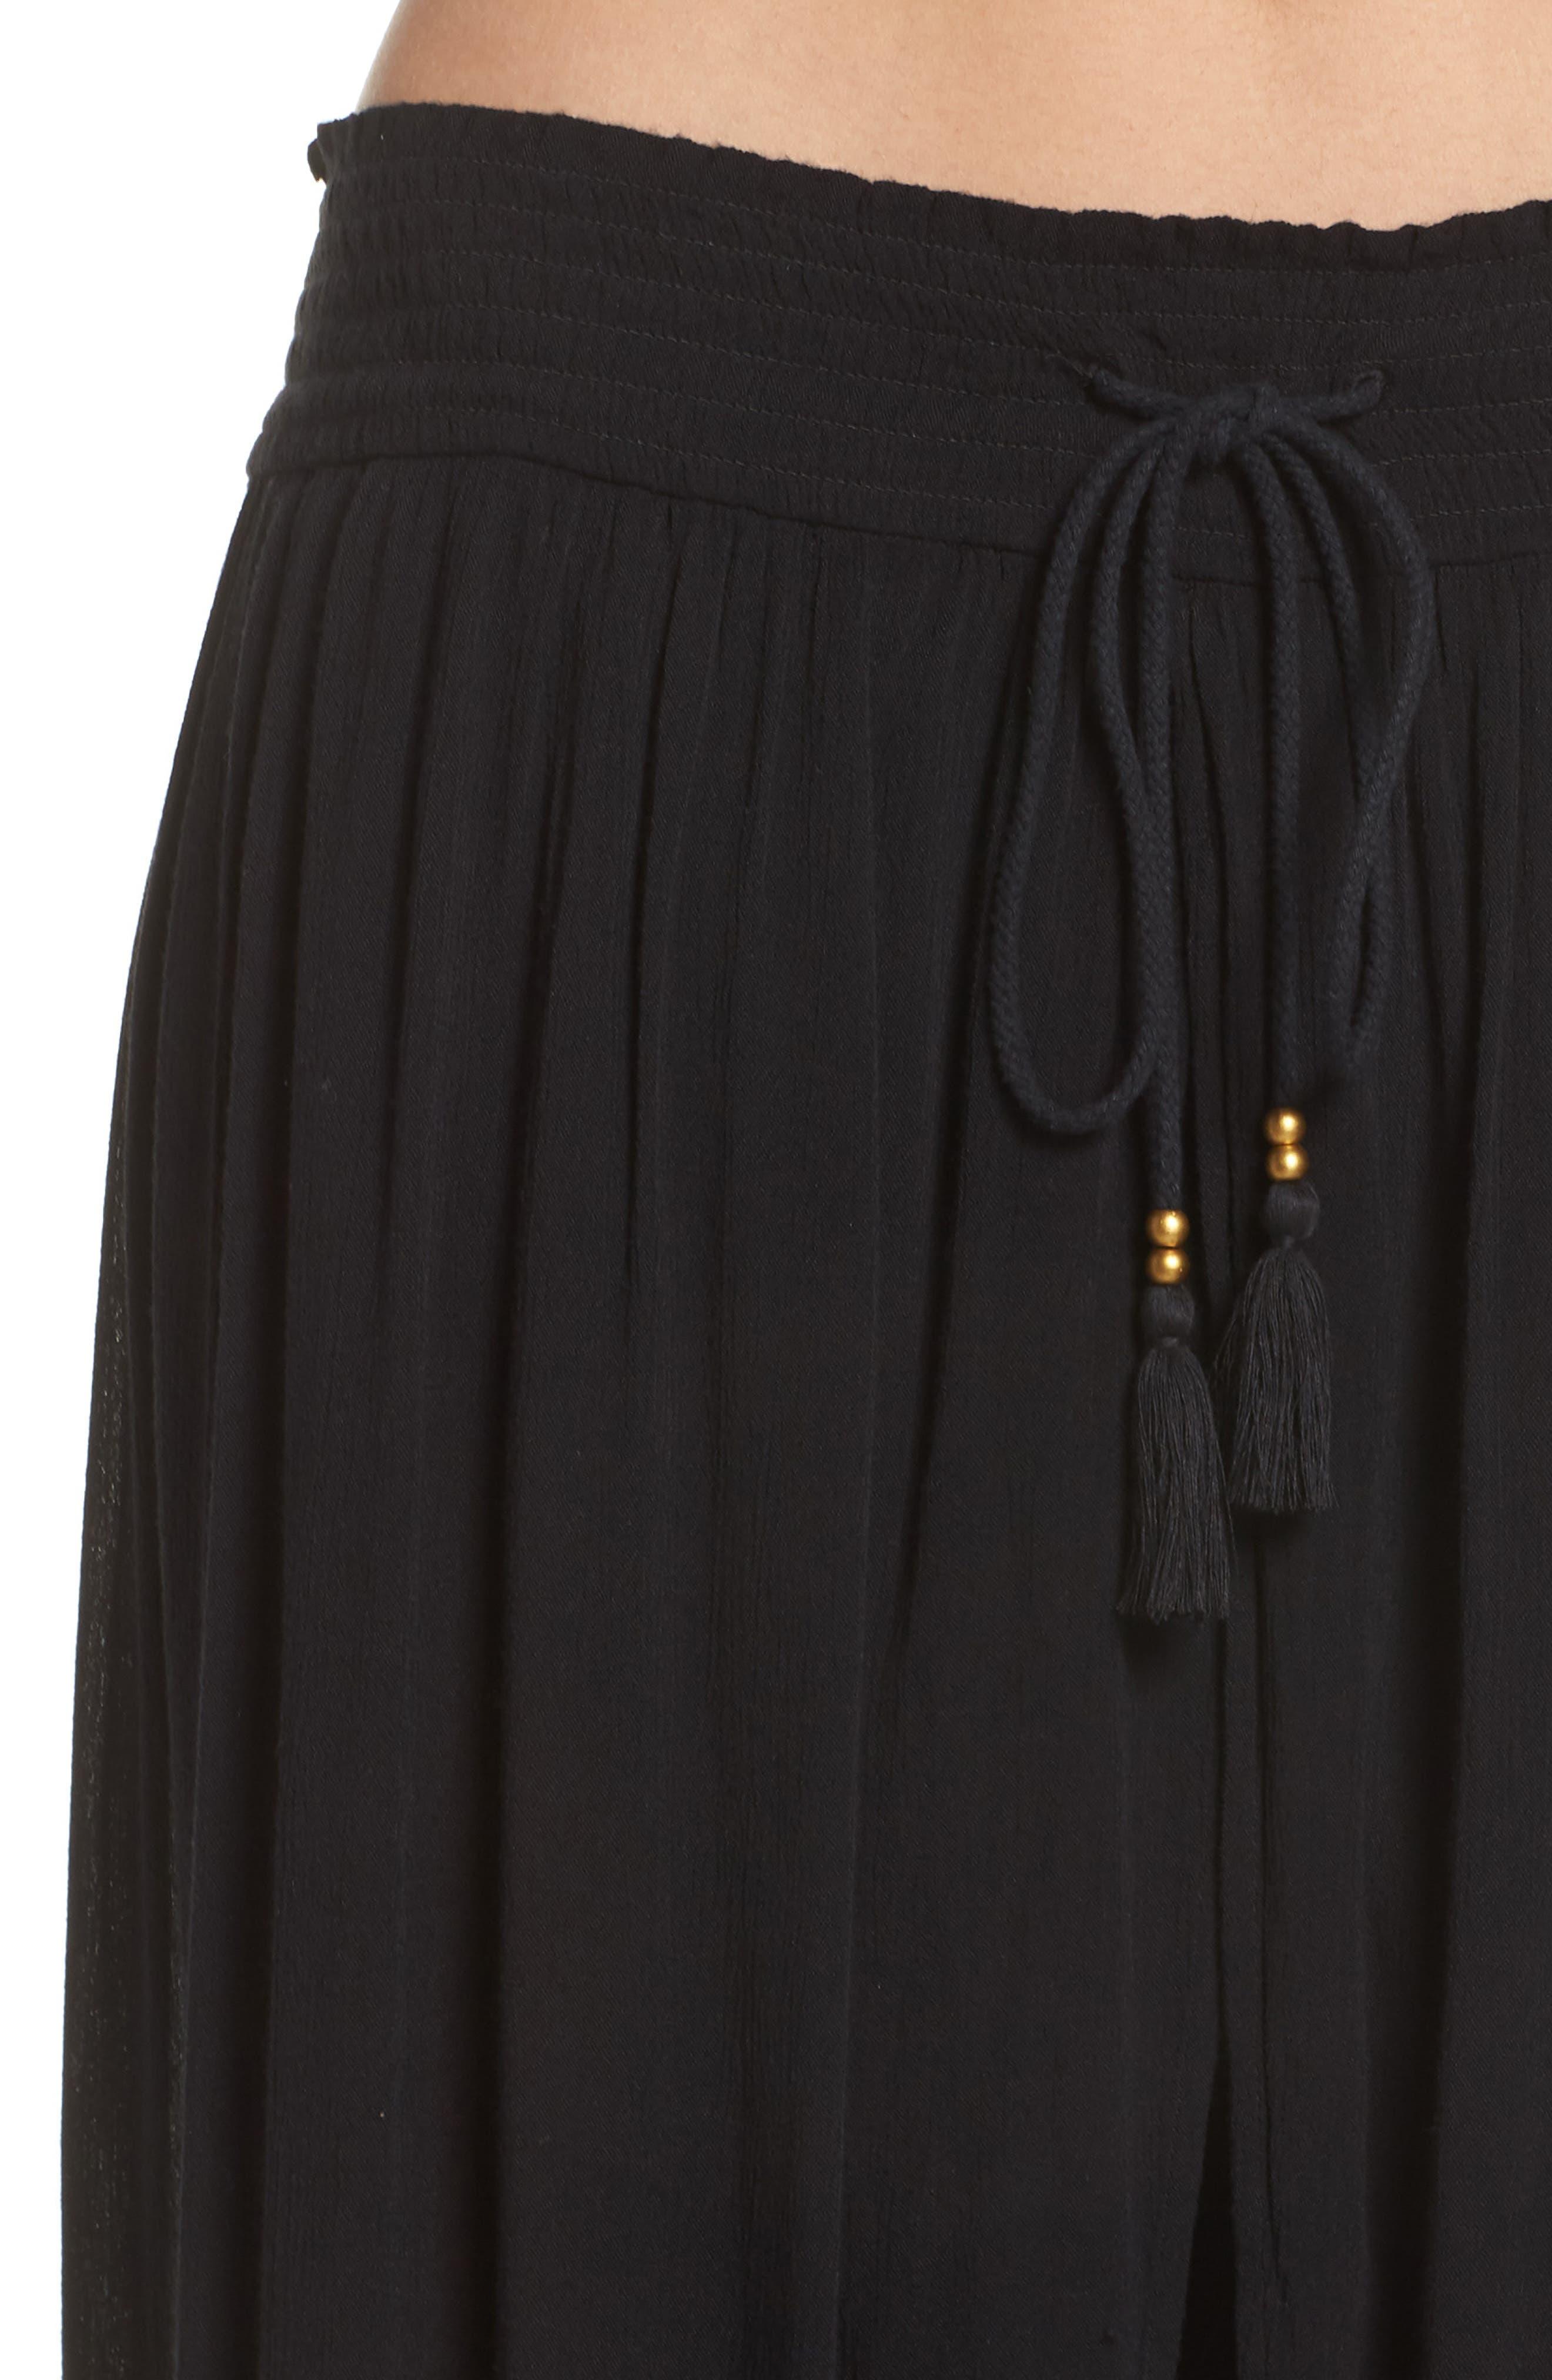 CHELSEA28, Gauze Cover-Up Pants, Alternate thumbnail 4, color, BLACK